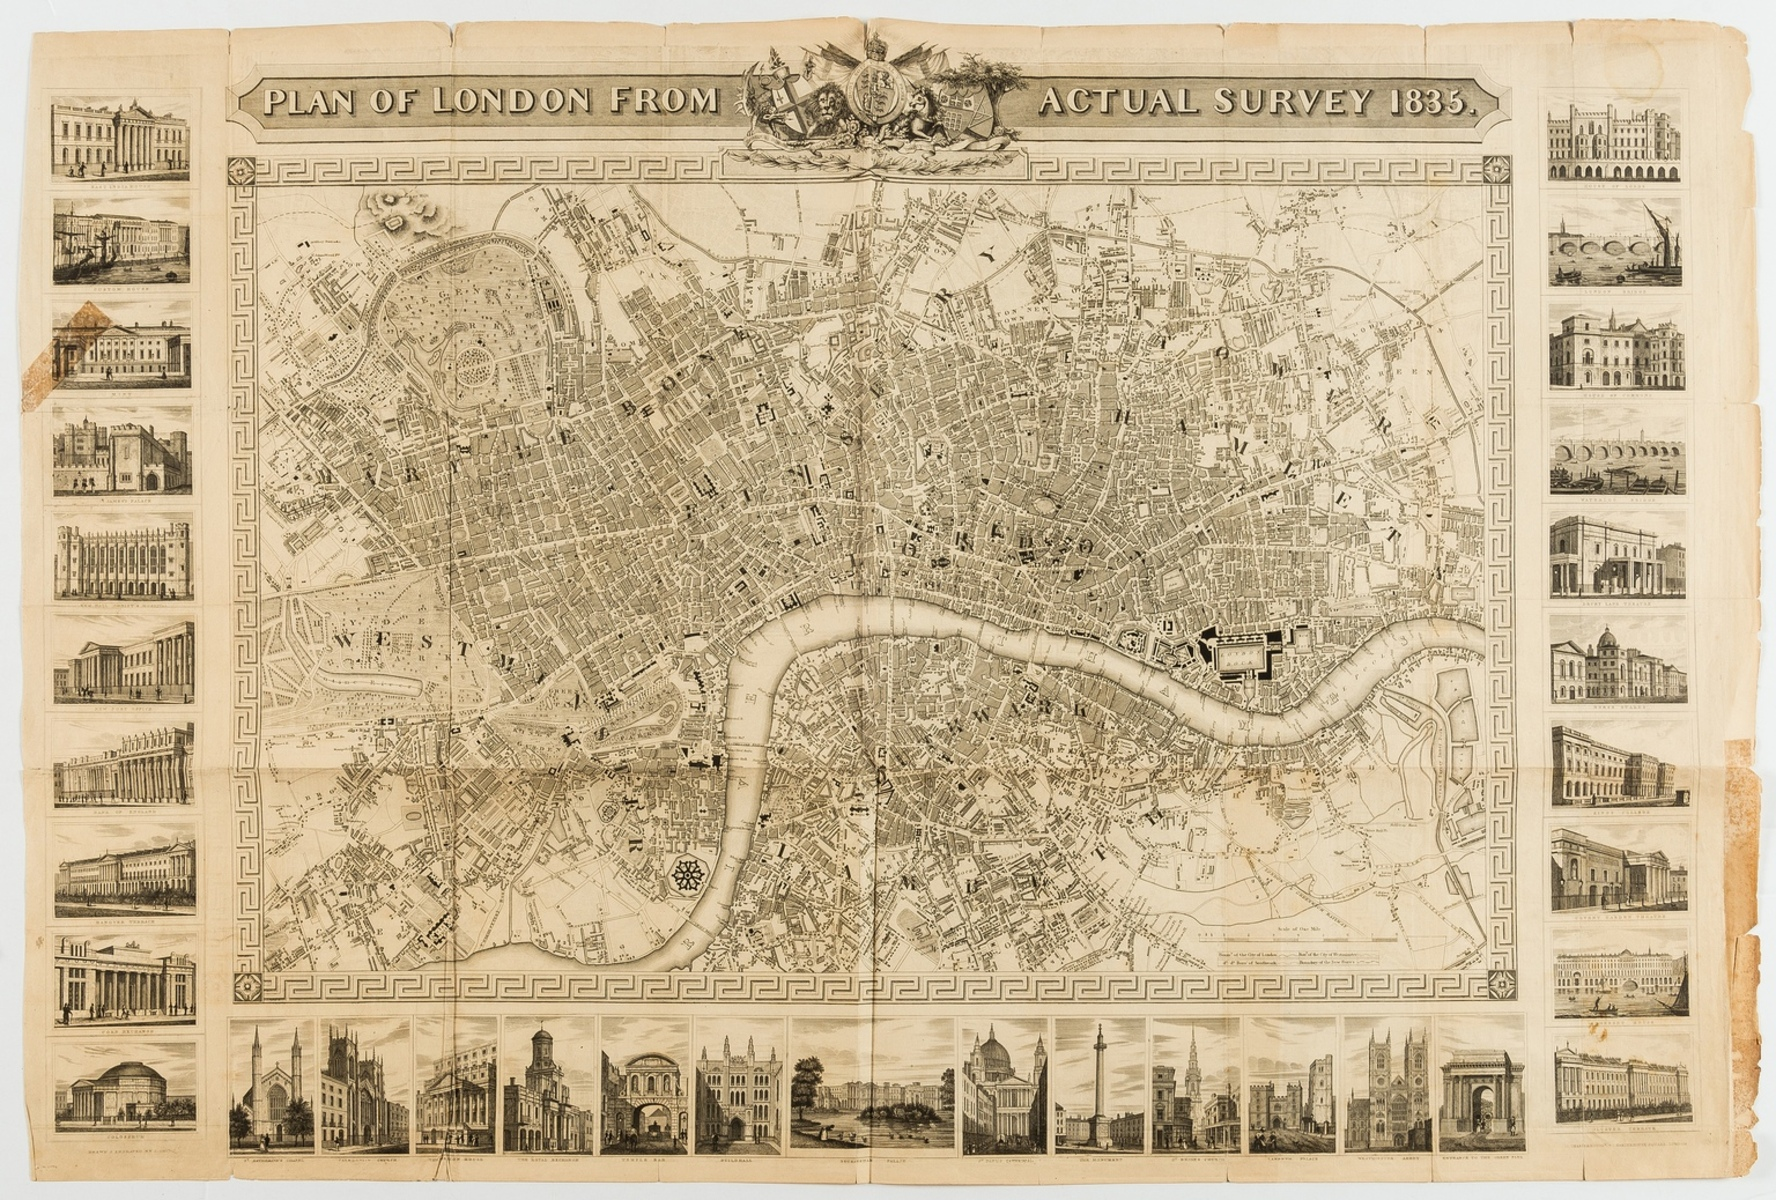 Shury (John) Plan of London From Actual Survey 1835.